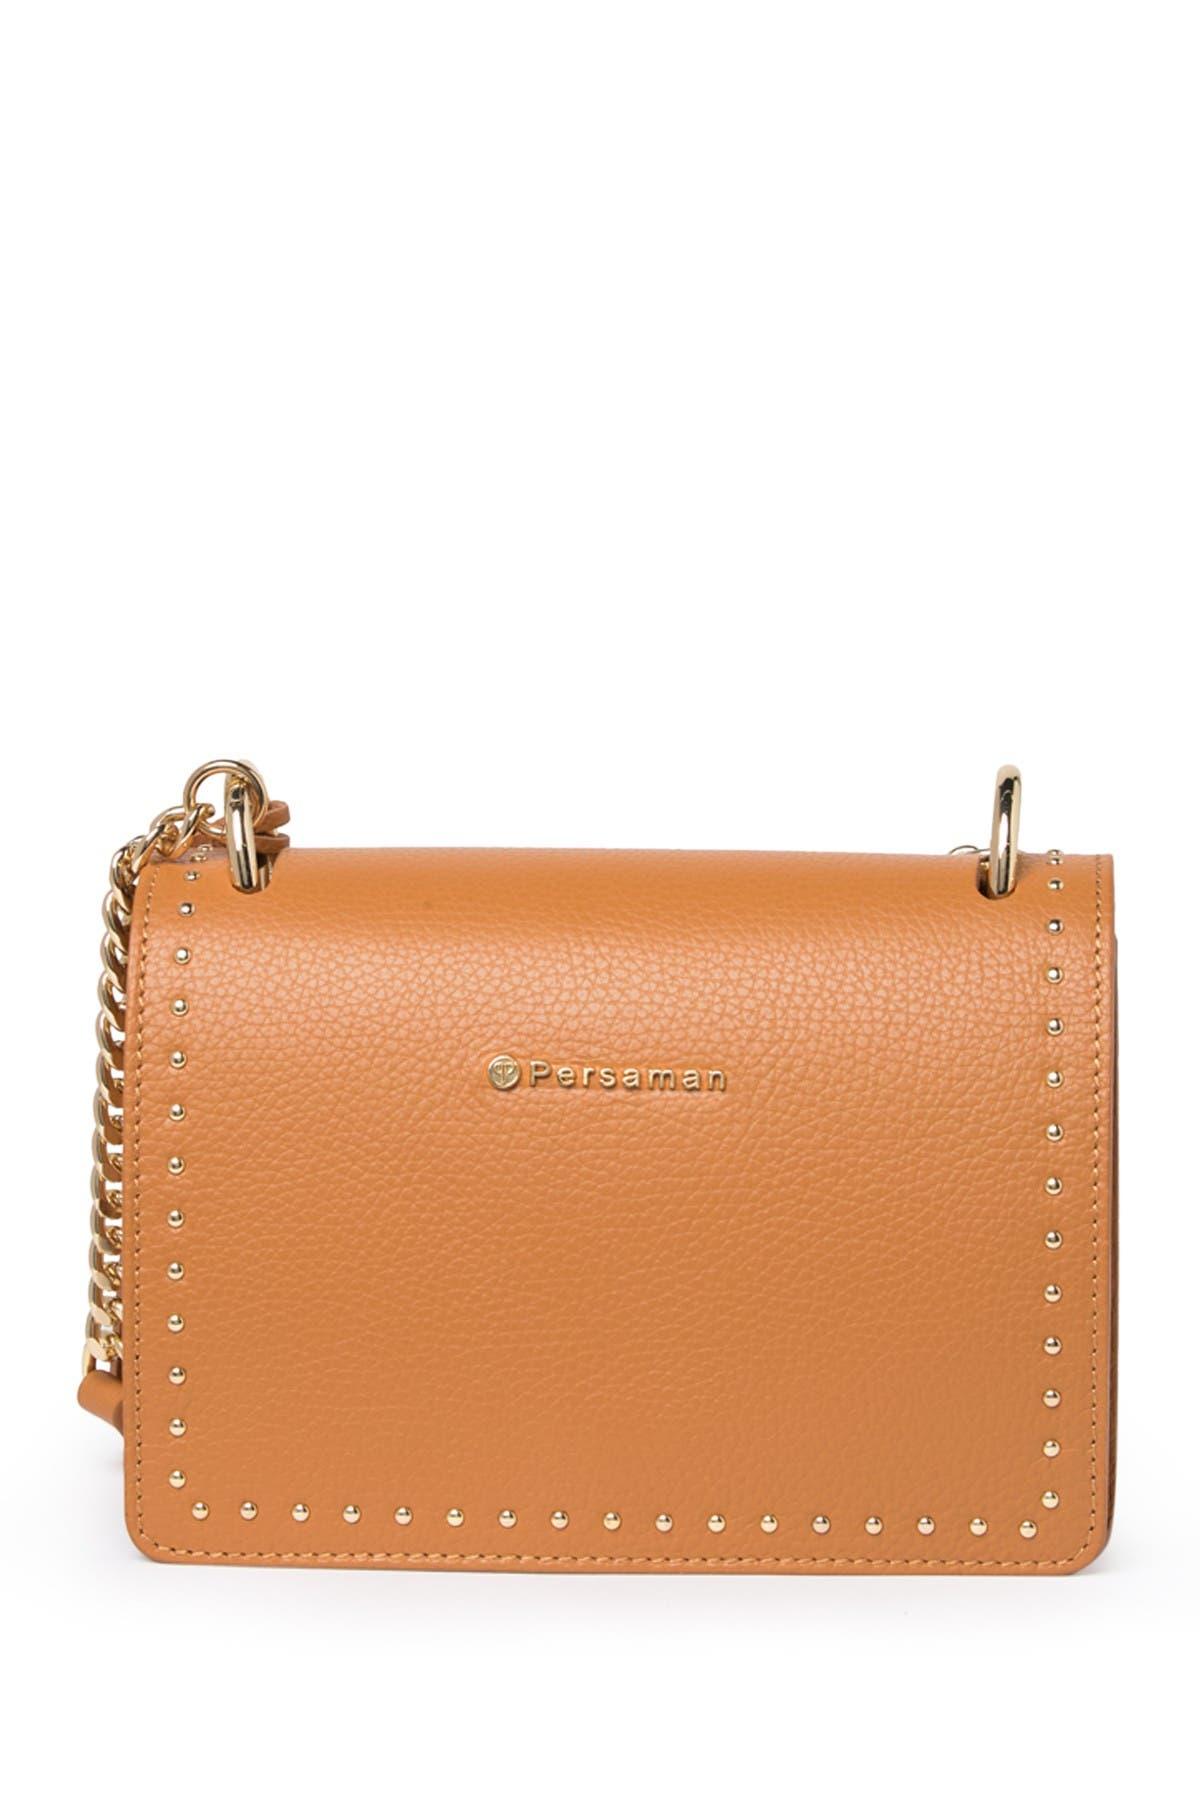 Image of Persaman New York Raphaelle Studded Leather Crossbody Bag